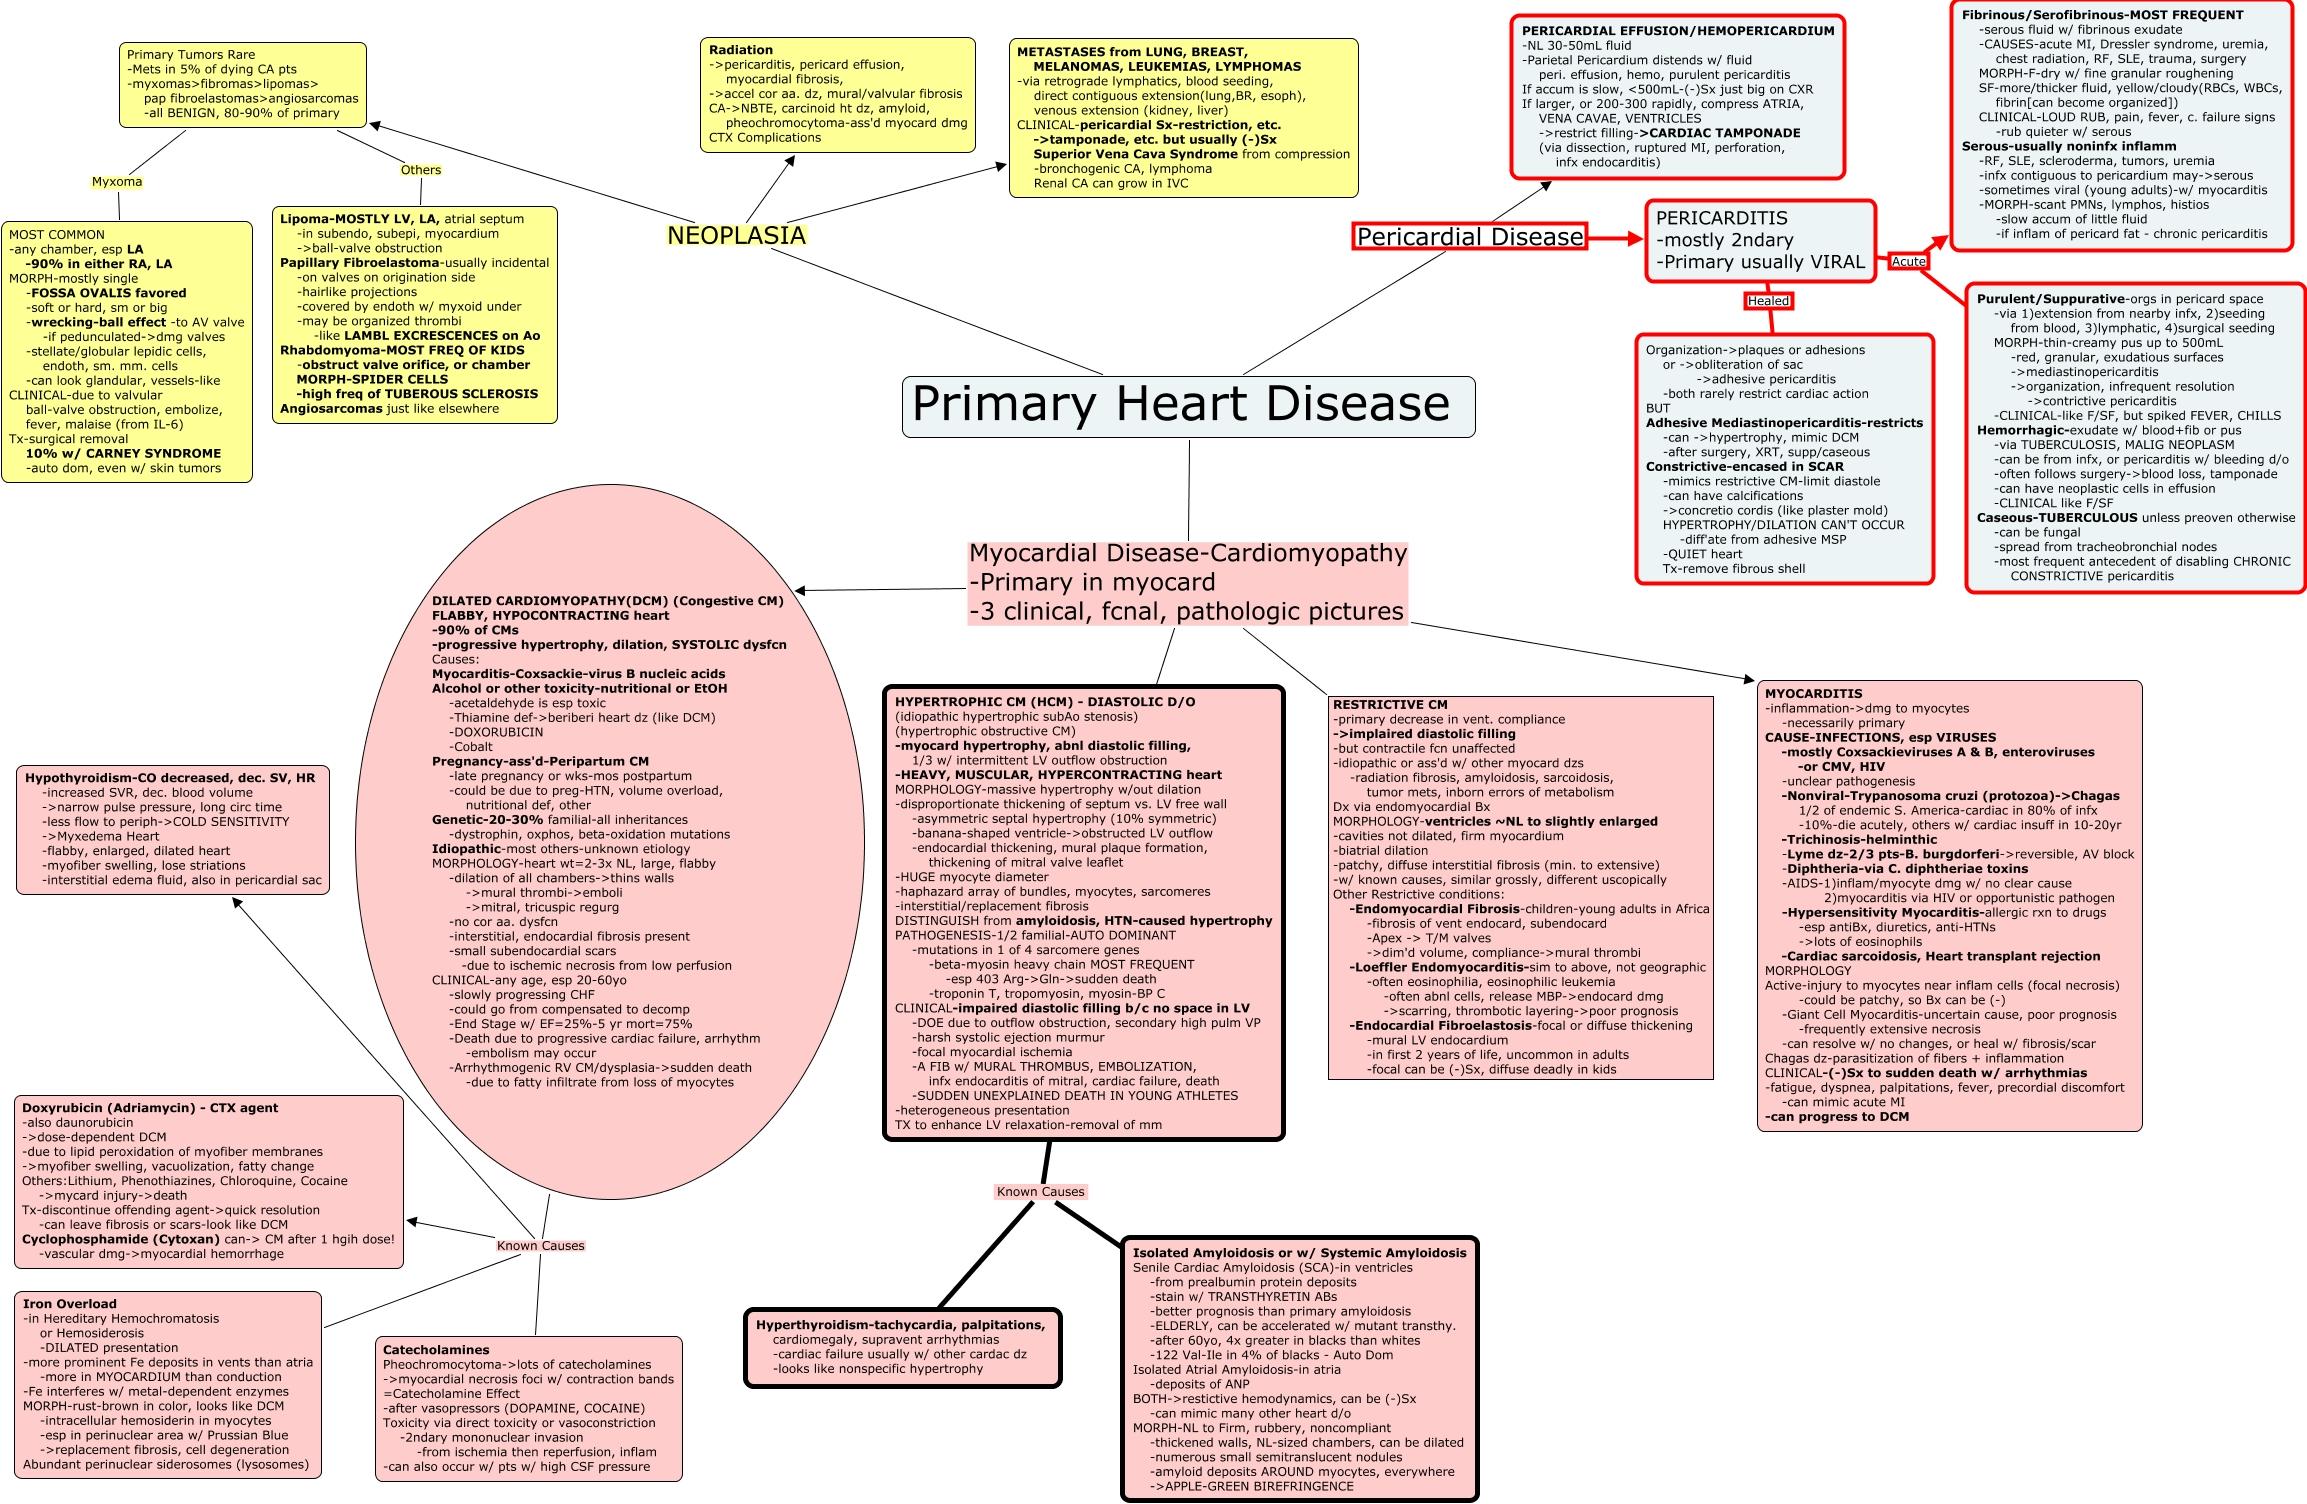 Postpartum Hemorrhage Concept Map.Primary Heart Disease